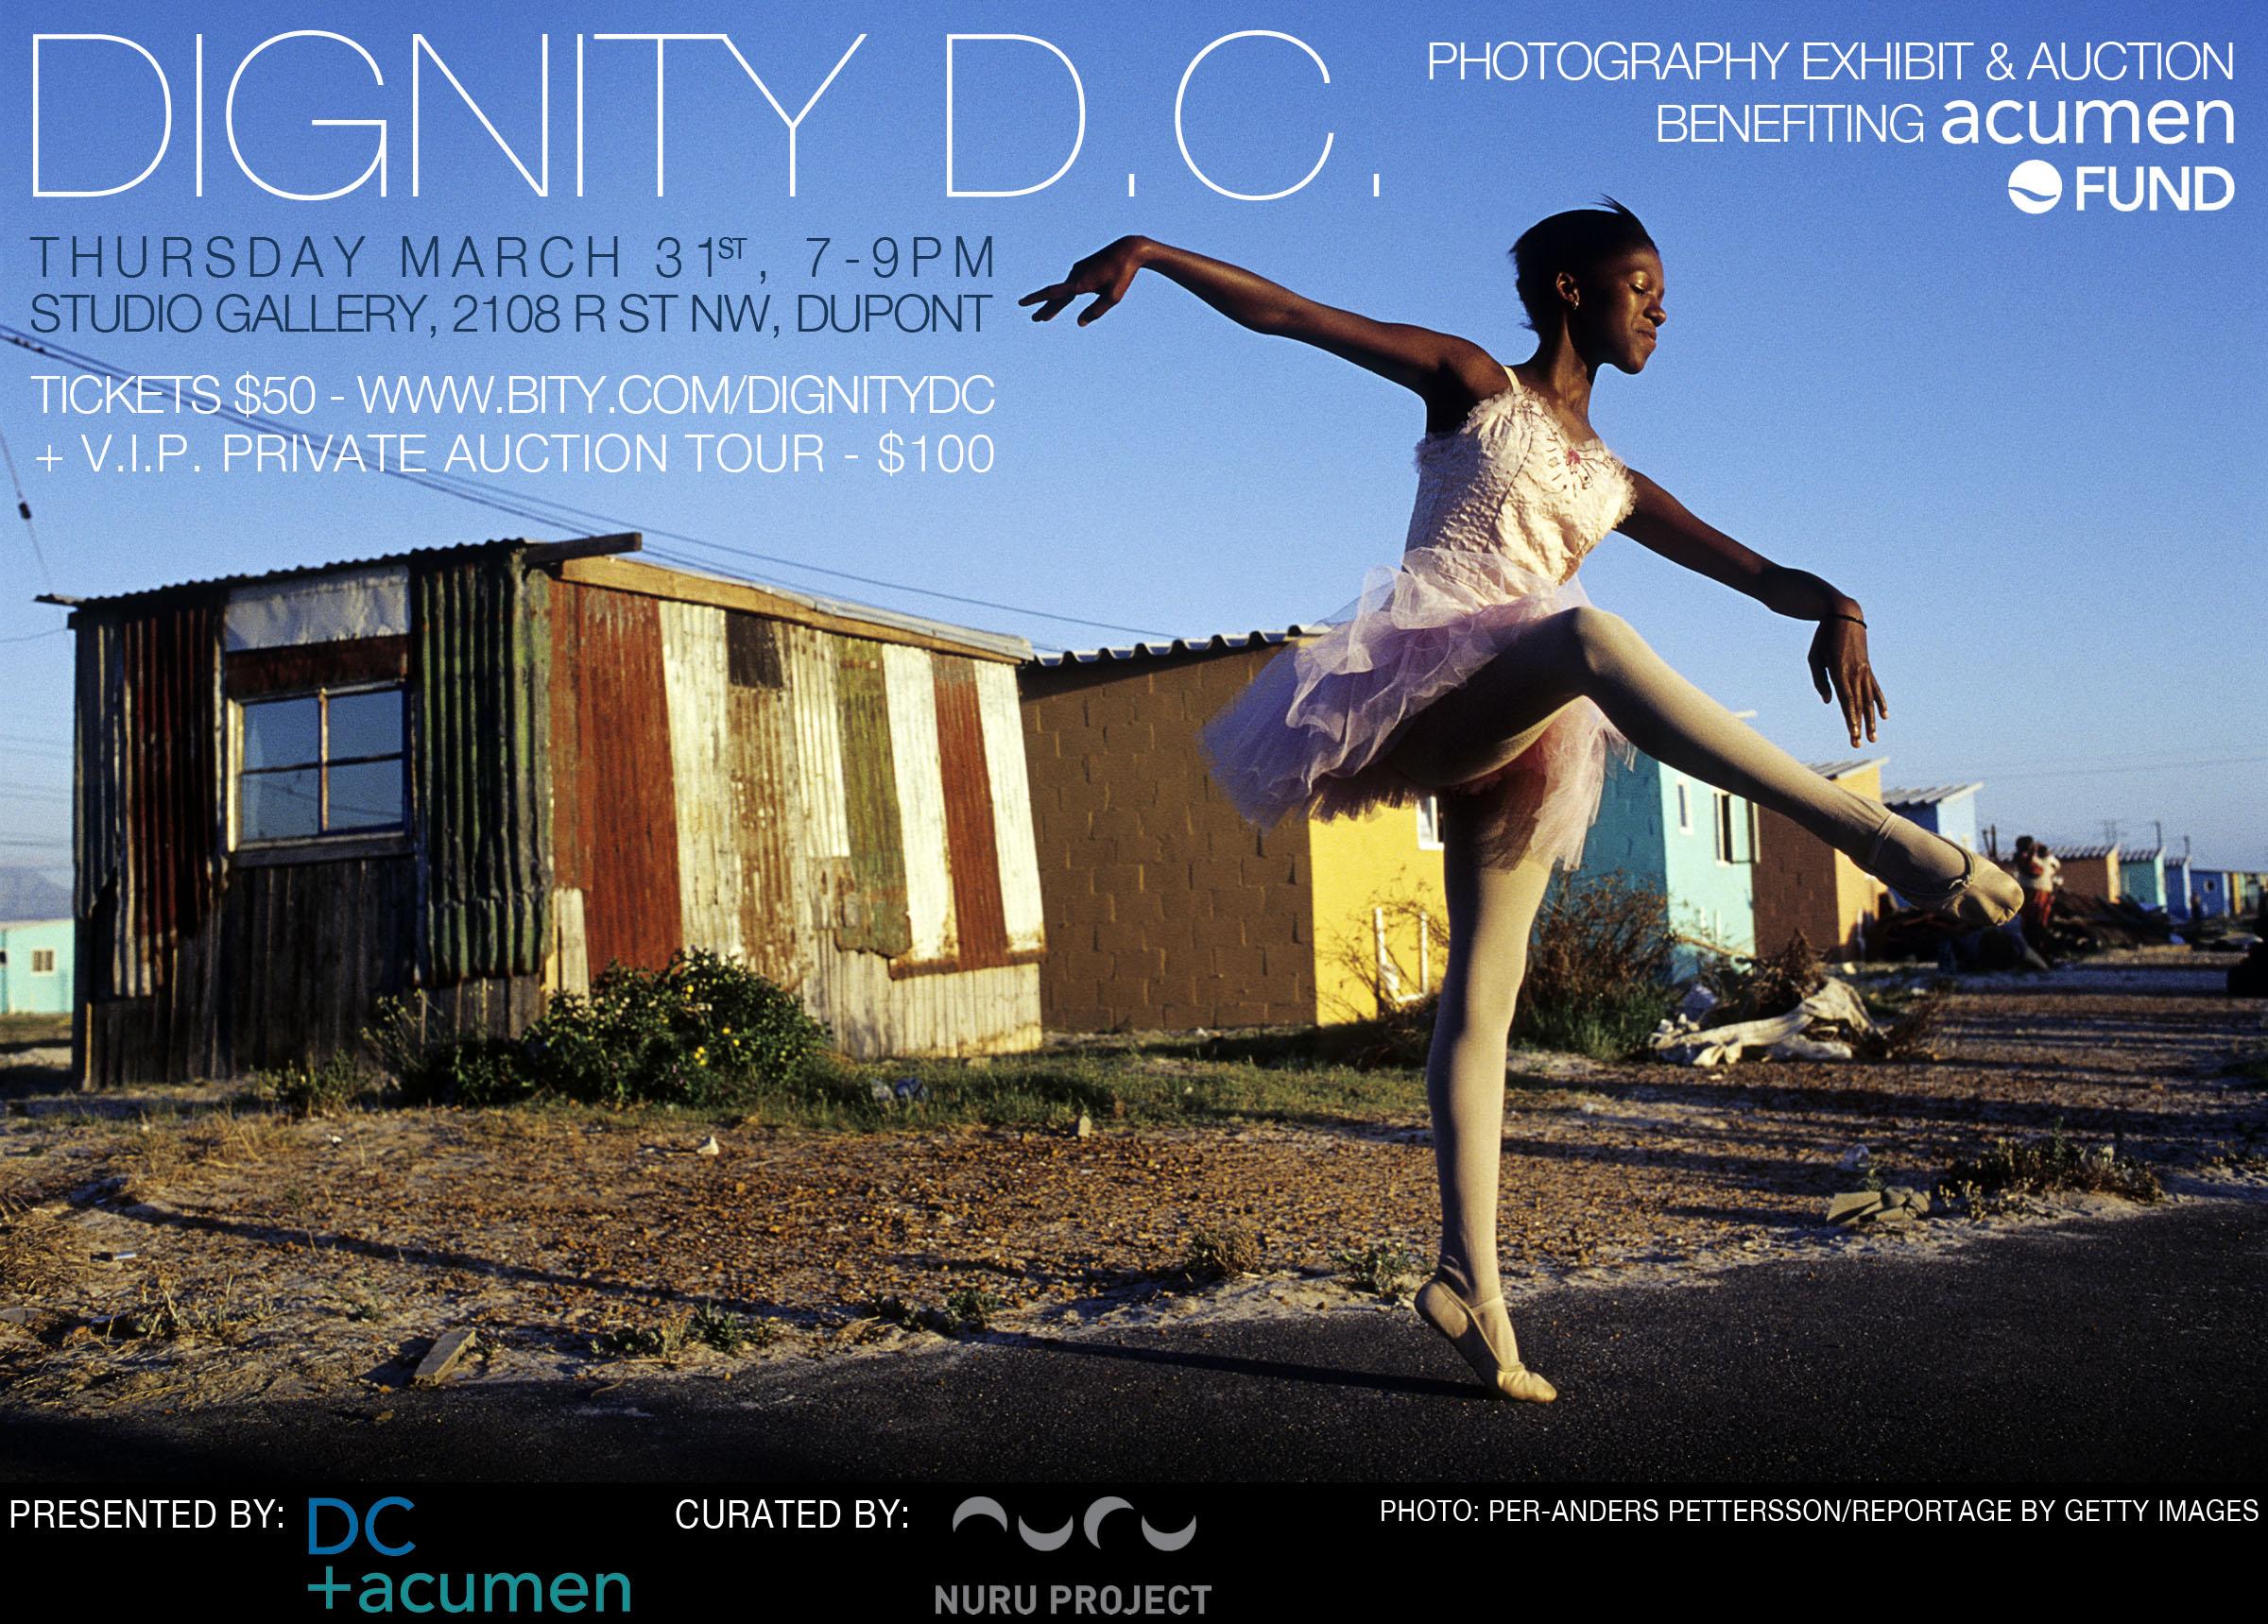 Image: DIGNITY DC